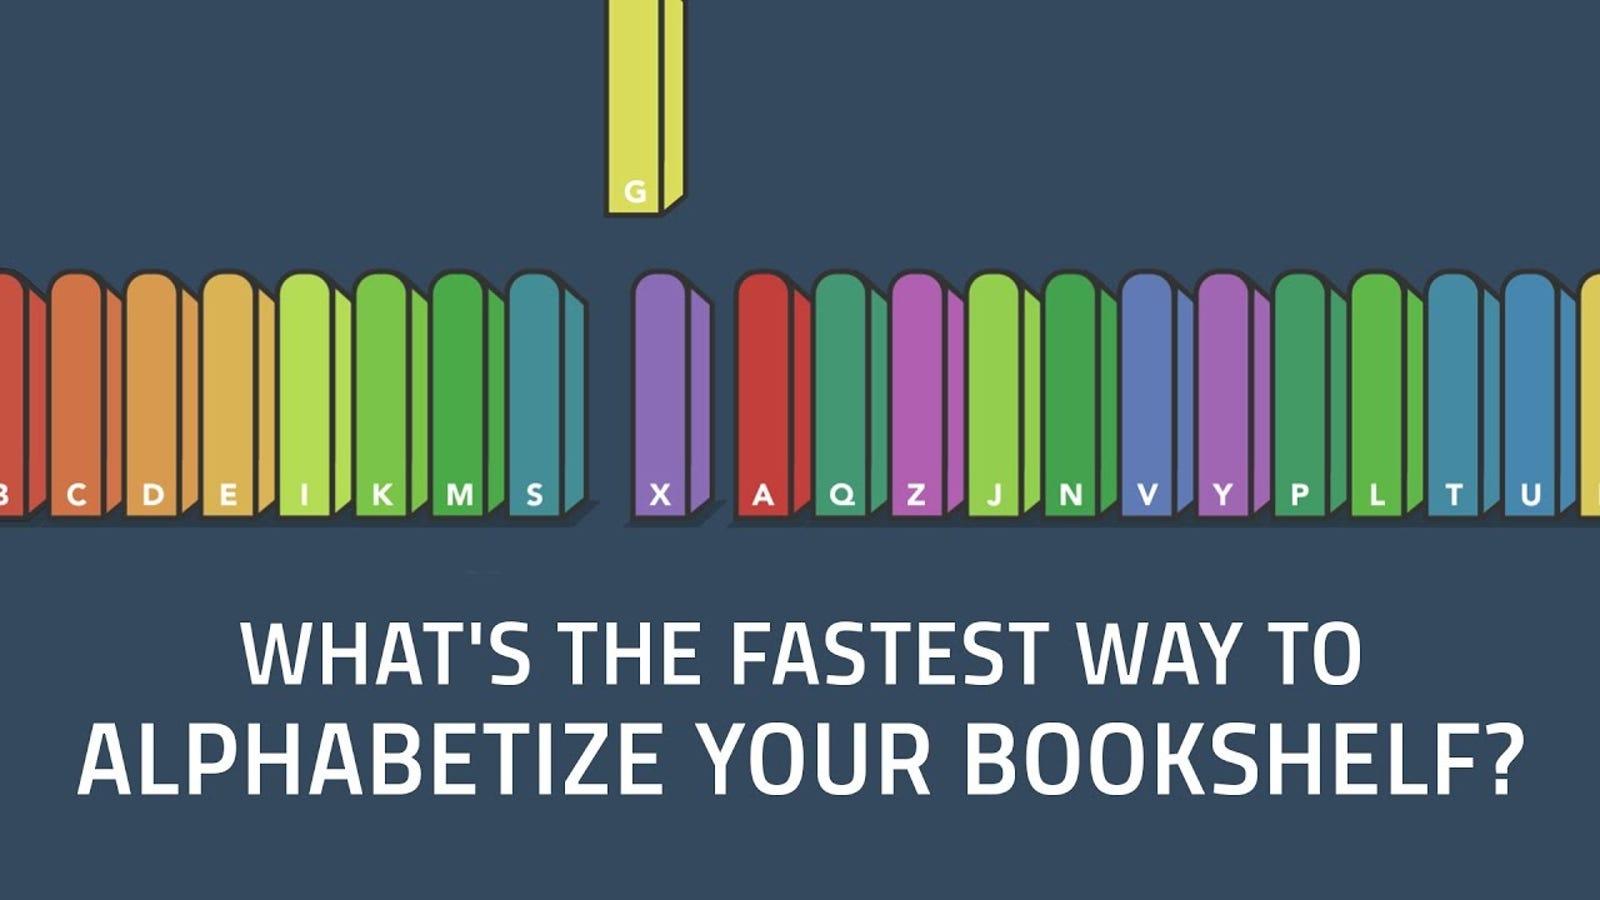 The Fastest Way to Alphabetize Your Bookshelf